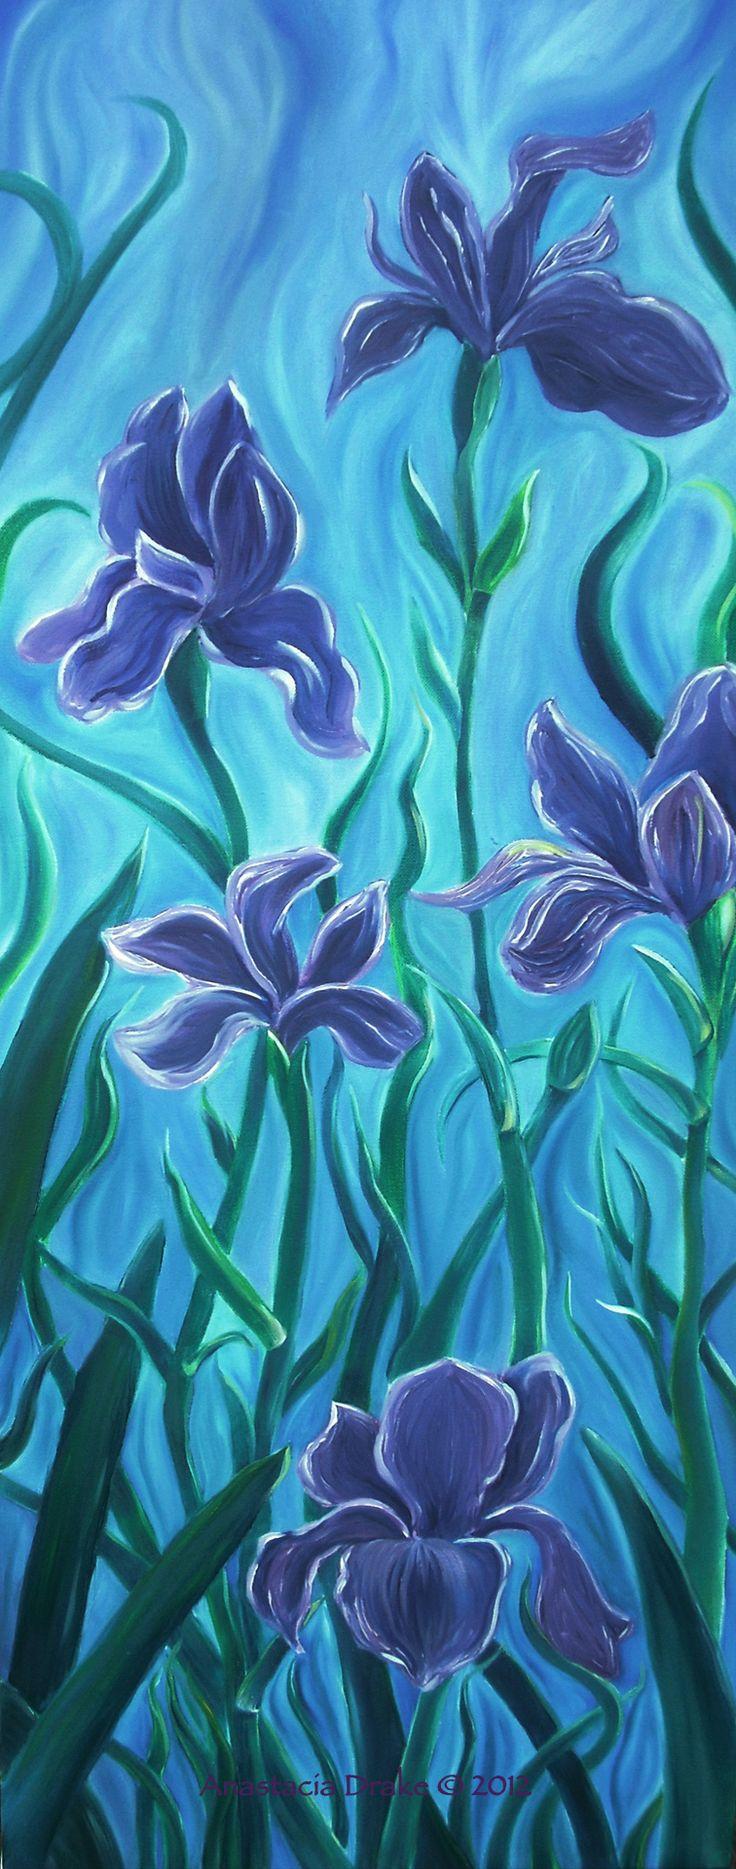 Iris Dance, Oil on Canvas #art #painting #strokeofredstudio